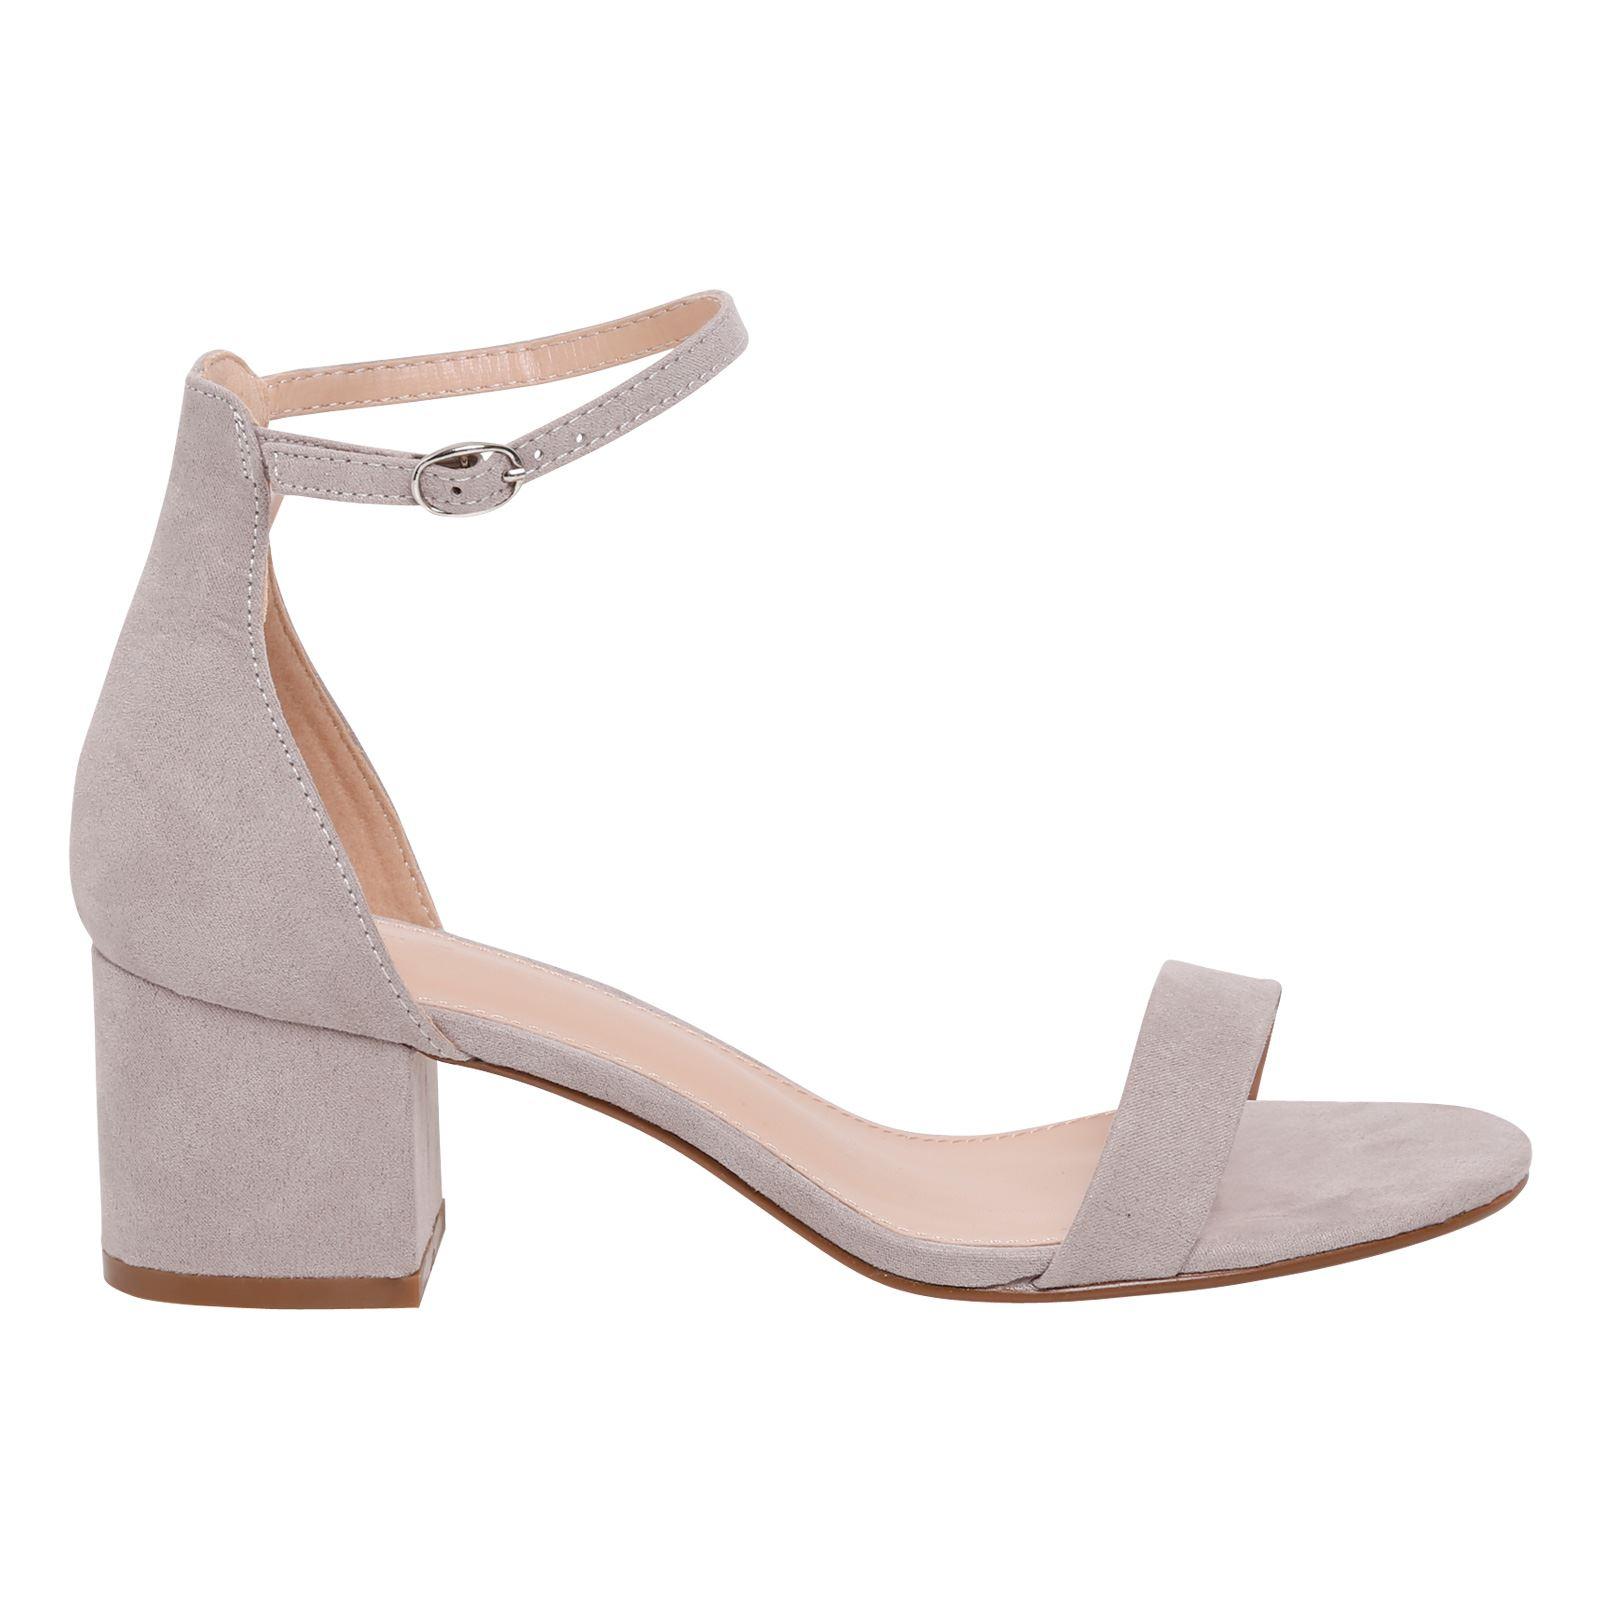 5d3f3d545107 Diana Womens Low Mid Block Heel Peep Toe Ankle Strap Buckle Sandals ...